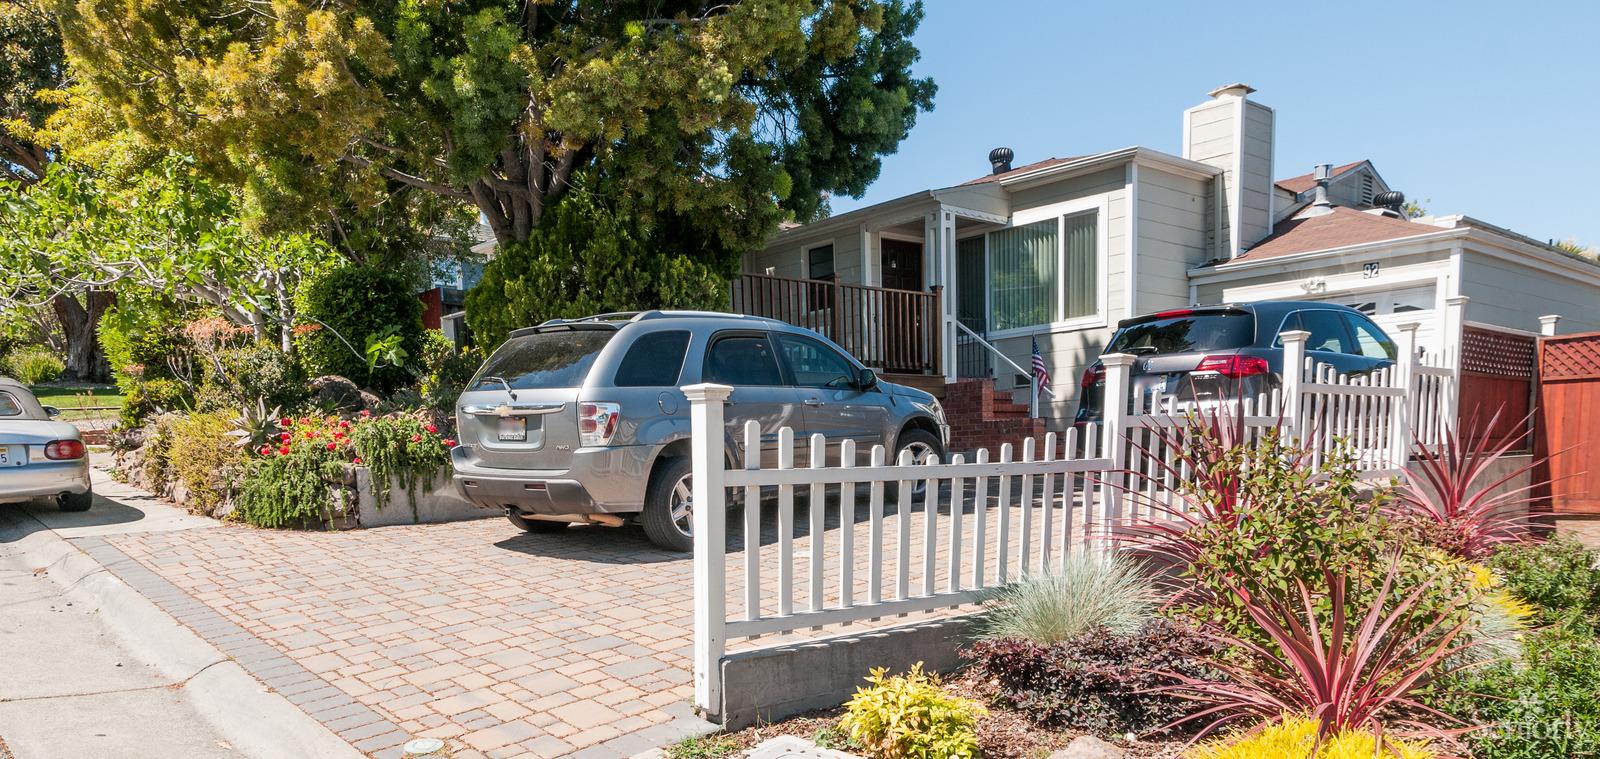 B&B Residential Facilities (92 W) San Mateo CA 1